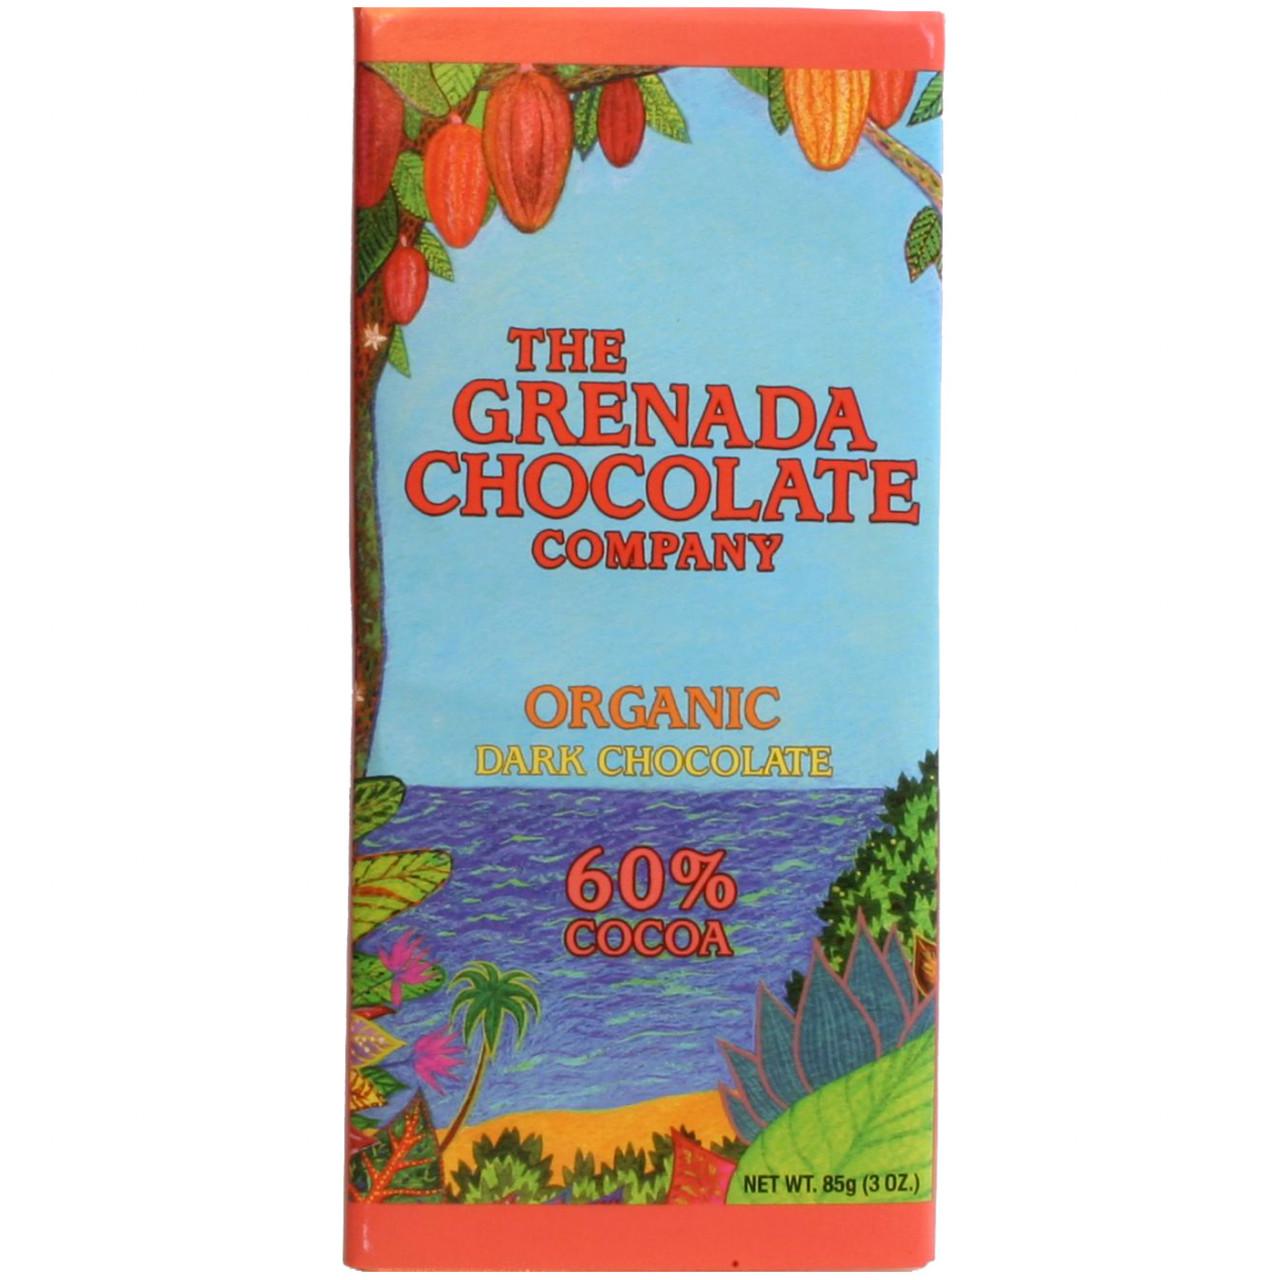 Nussfreie Schokolade, Bio Schokolade, Organic chocolate, Grenada Chocolate Co, chocolat noir, cocoa, cacao, Mott Green